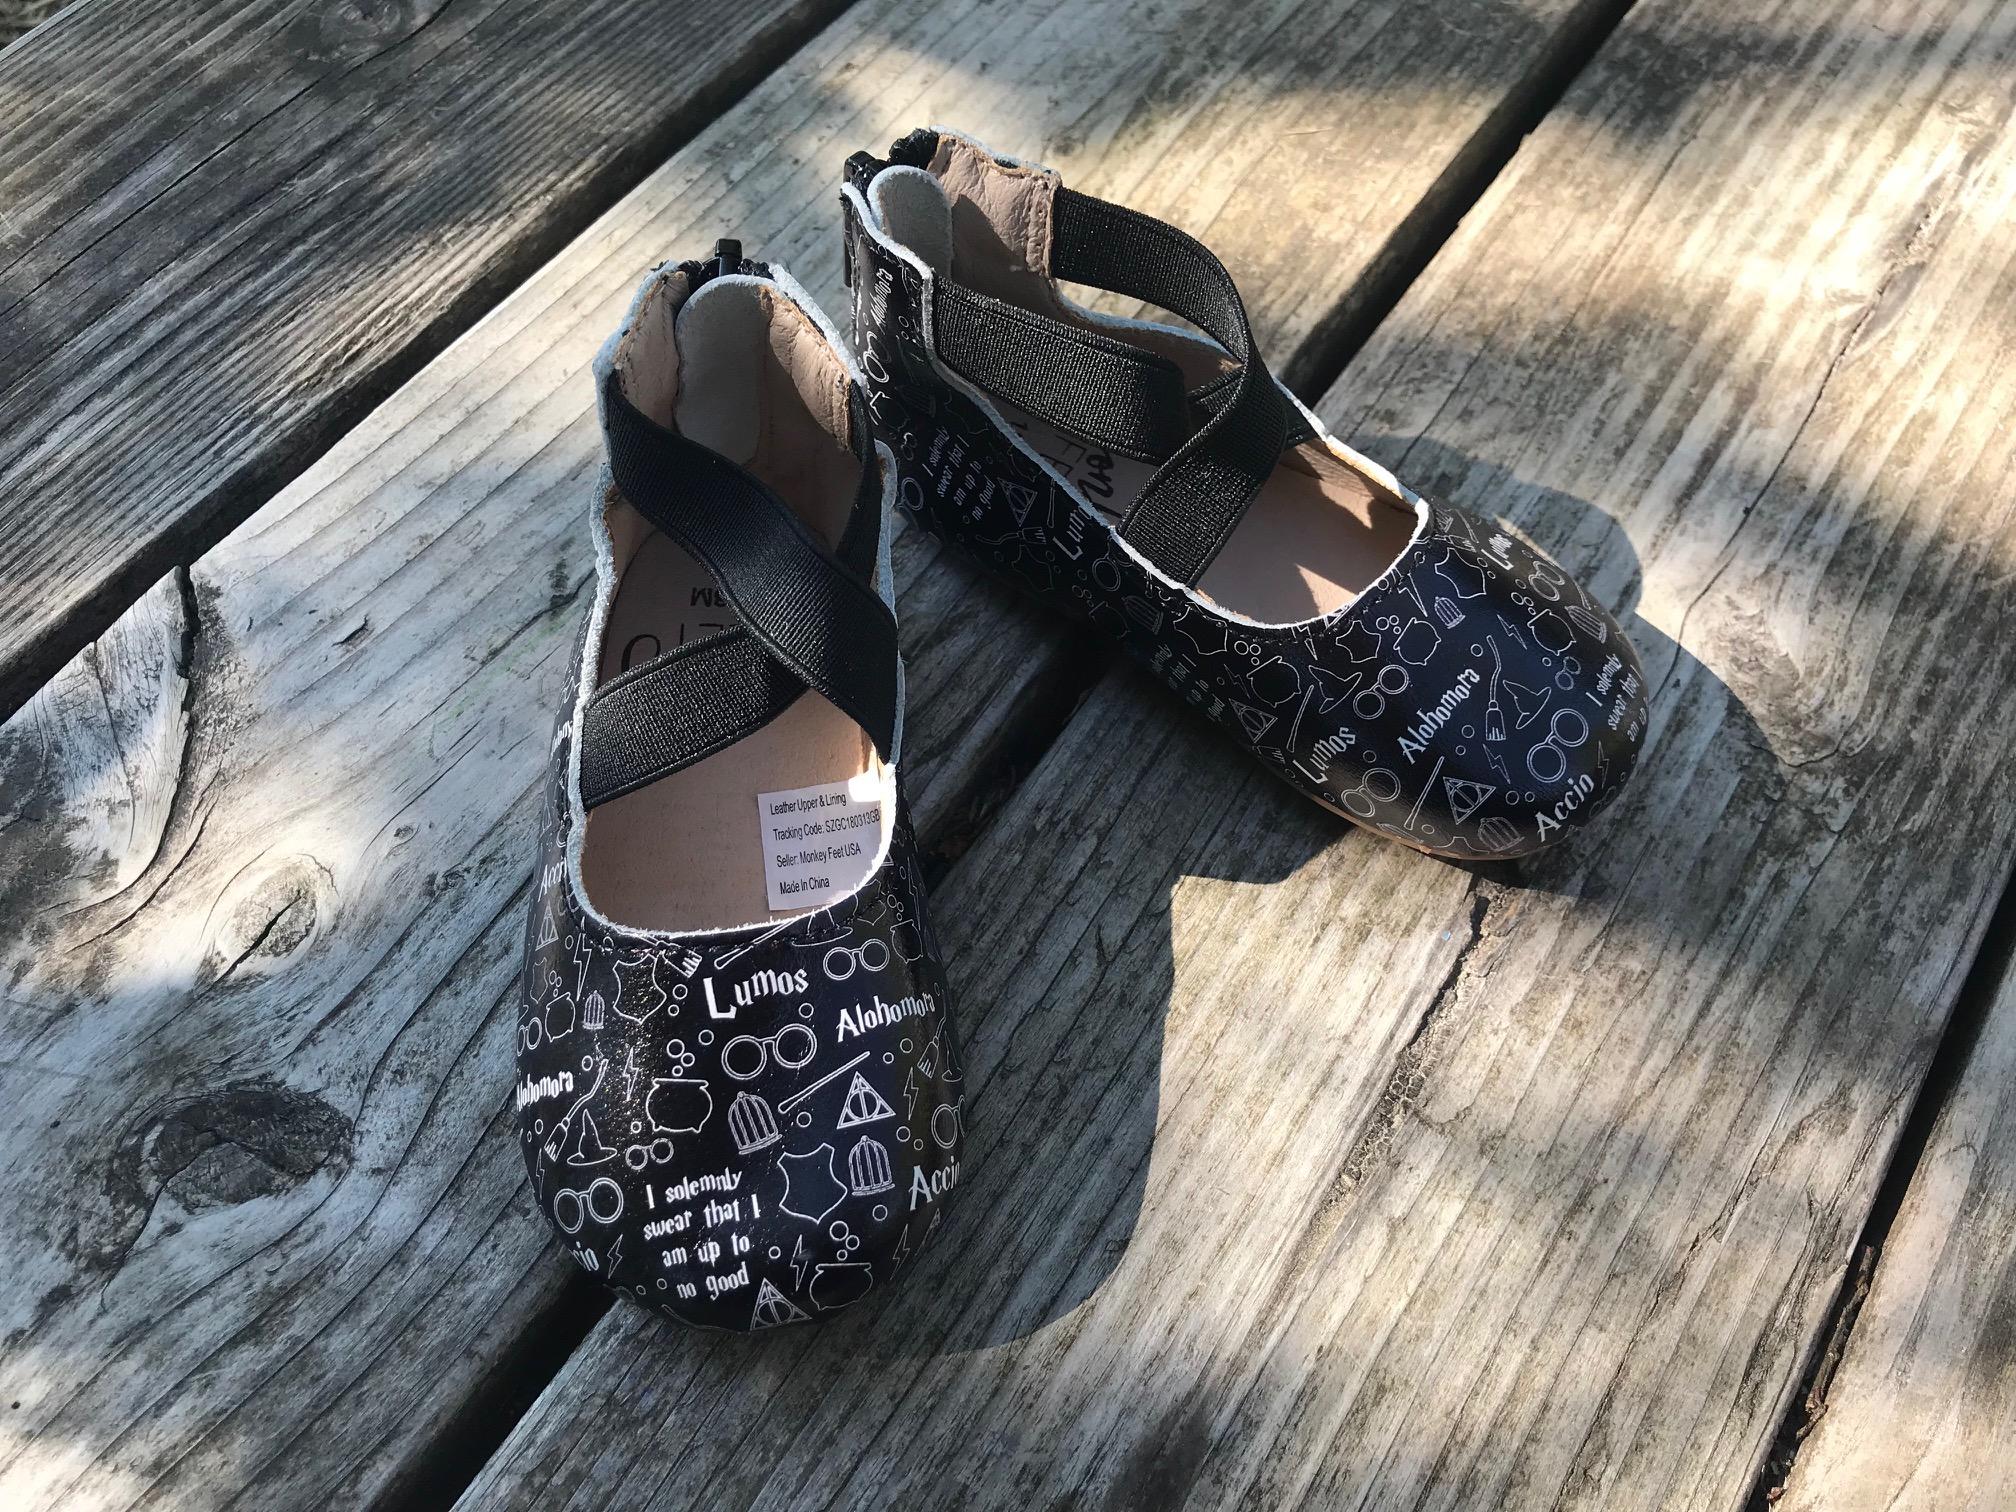 Monkey Feet Black Leather Ballet Style Zip Back Toddler Shoes [Harry Potter Theme Print]